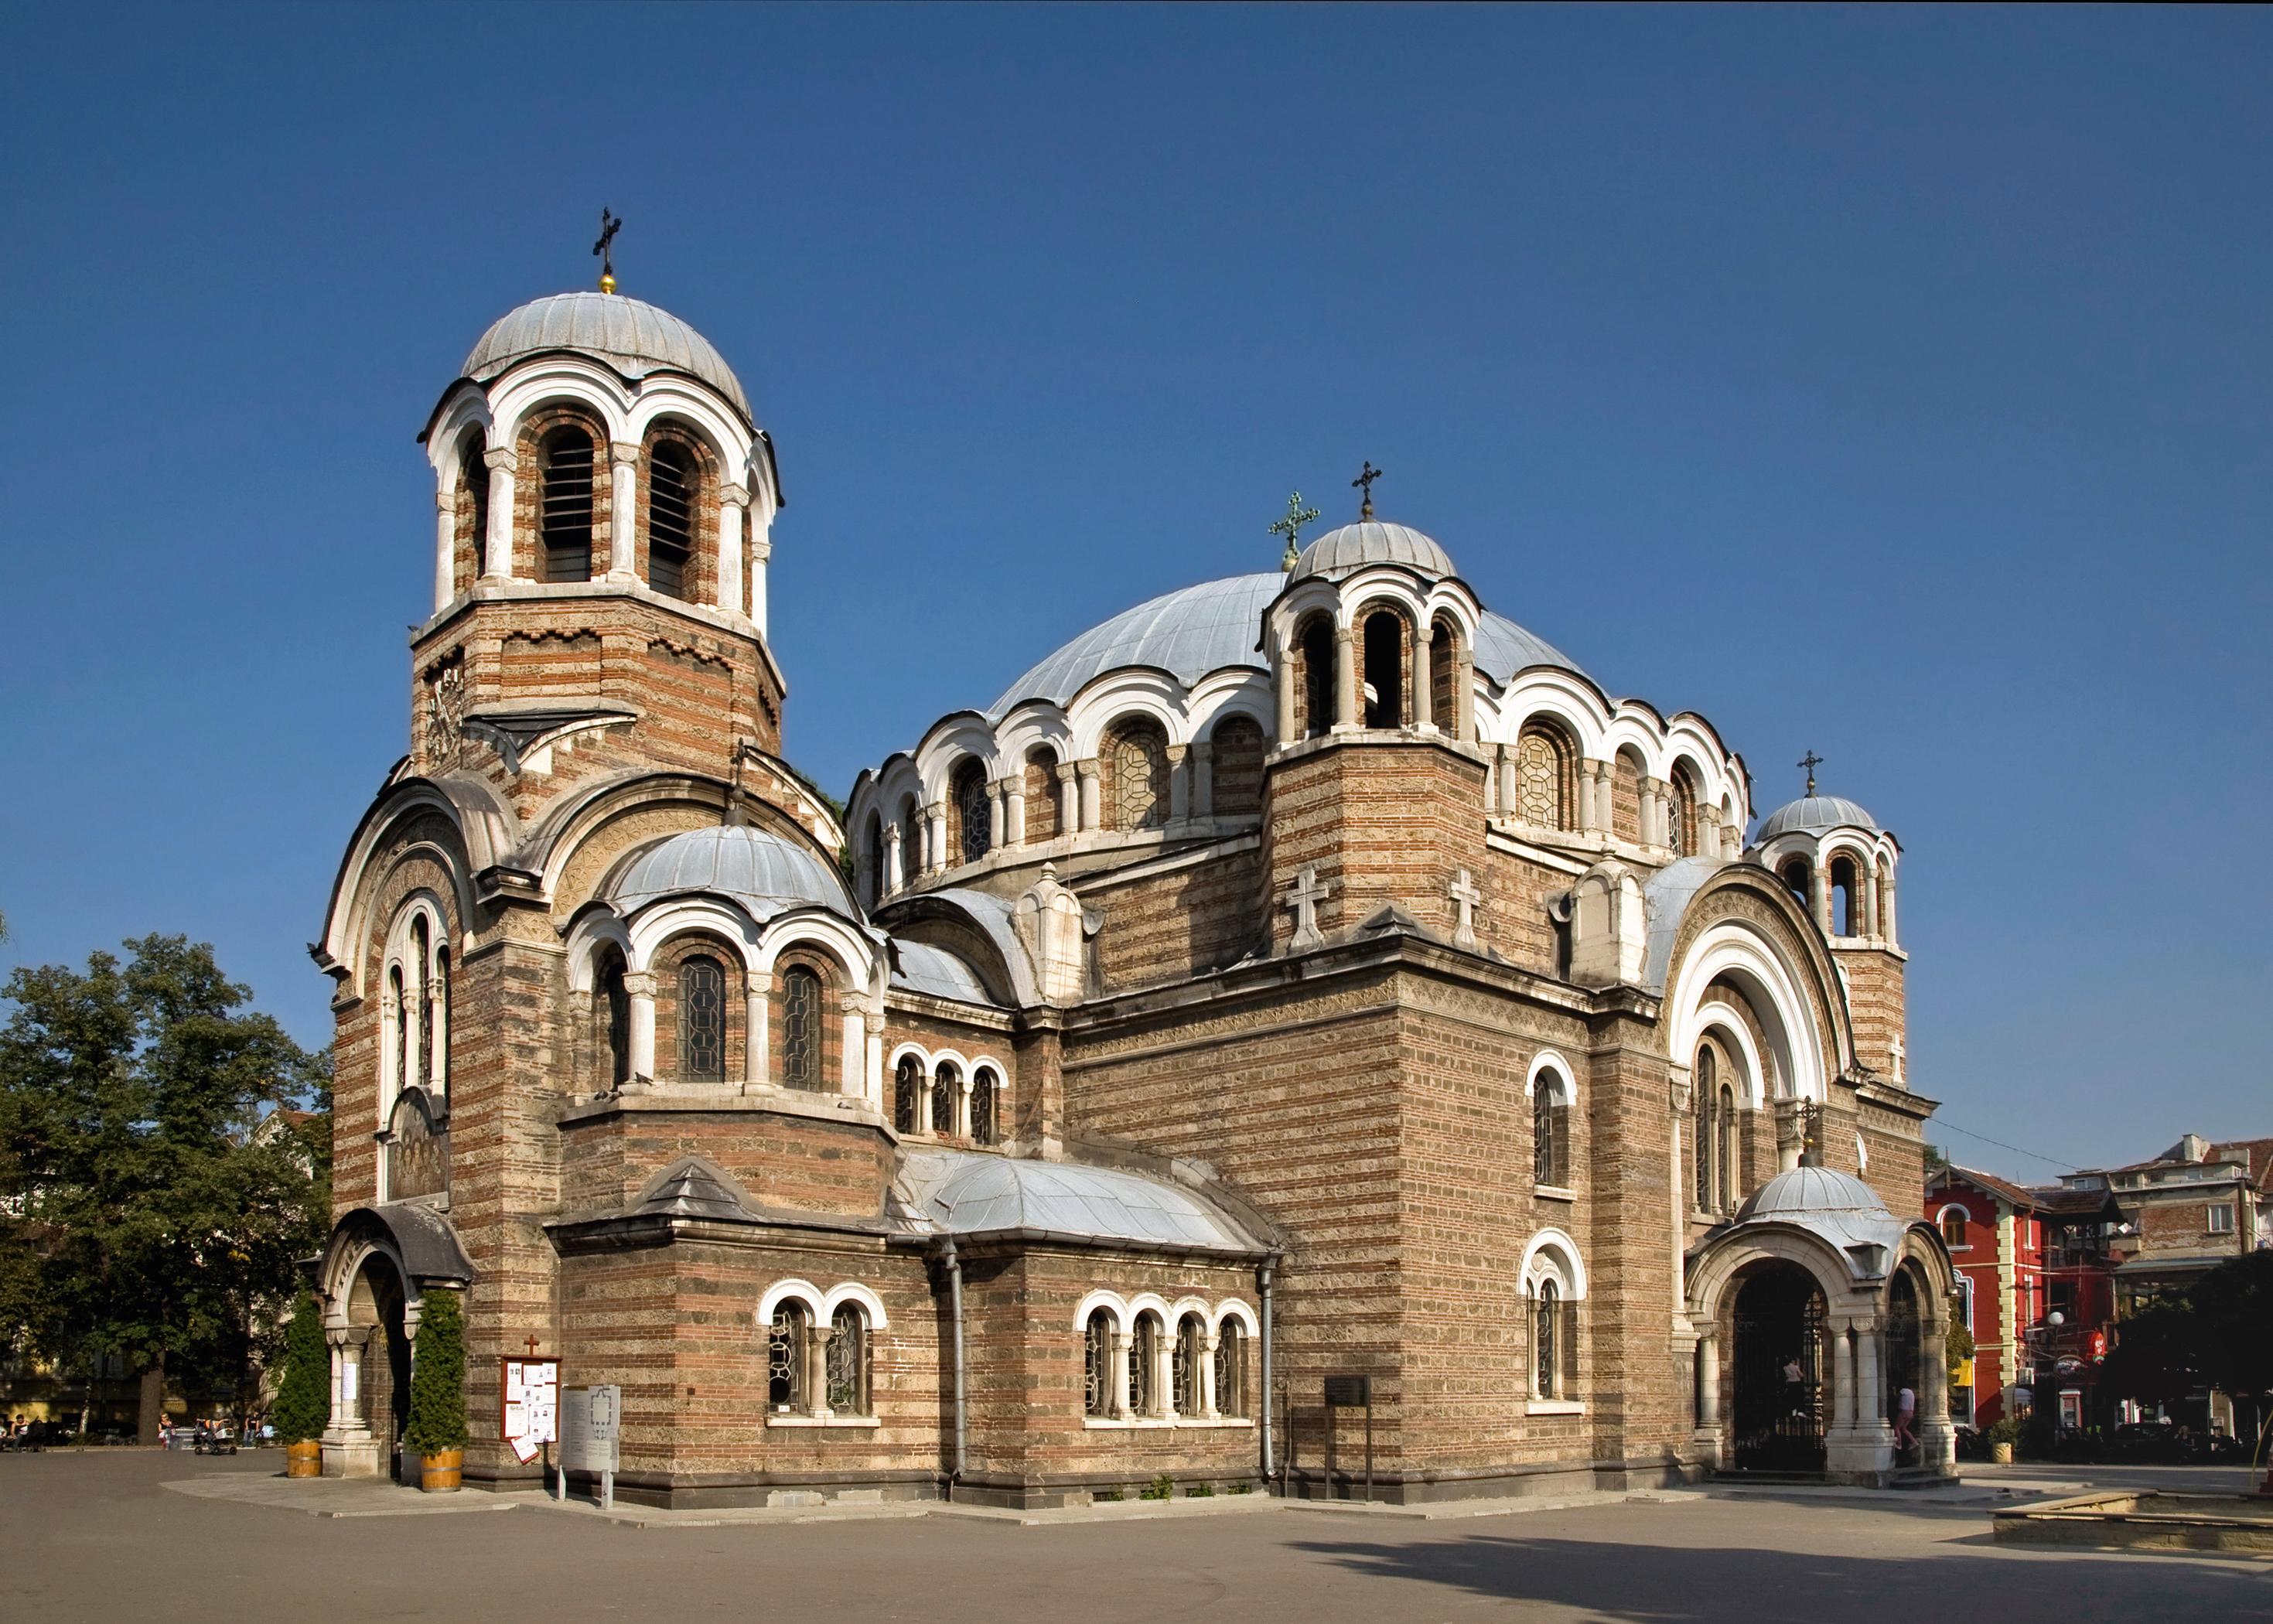 https://upload.wikimedia.org/wikipedia/commons/a/a2/SvetiSedmochislenitsiChurch-Sofia-3.jpg